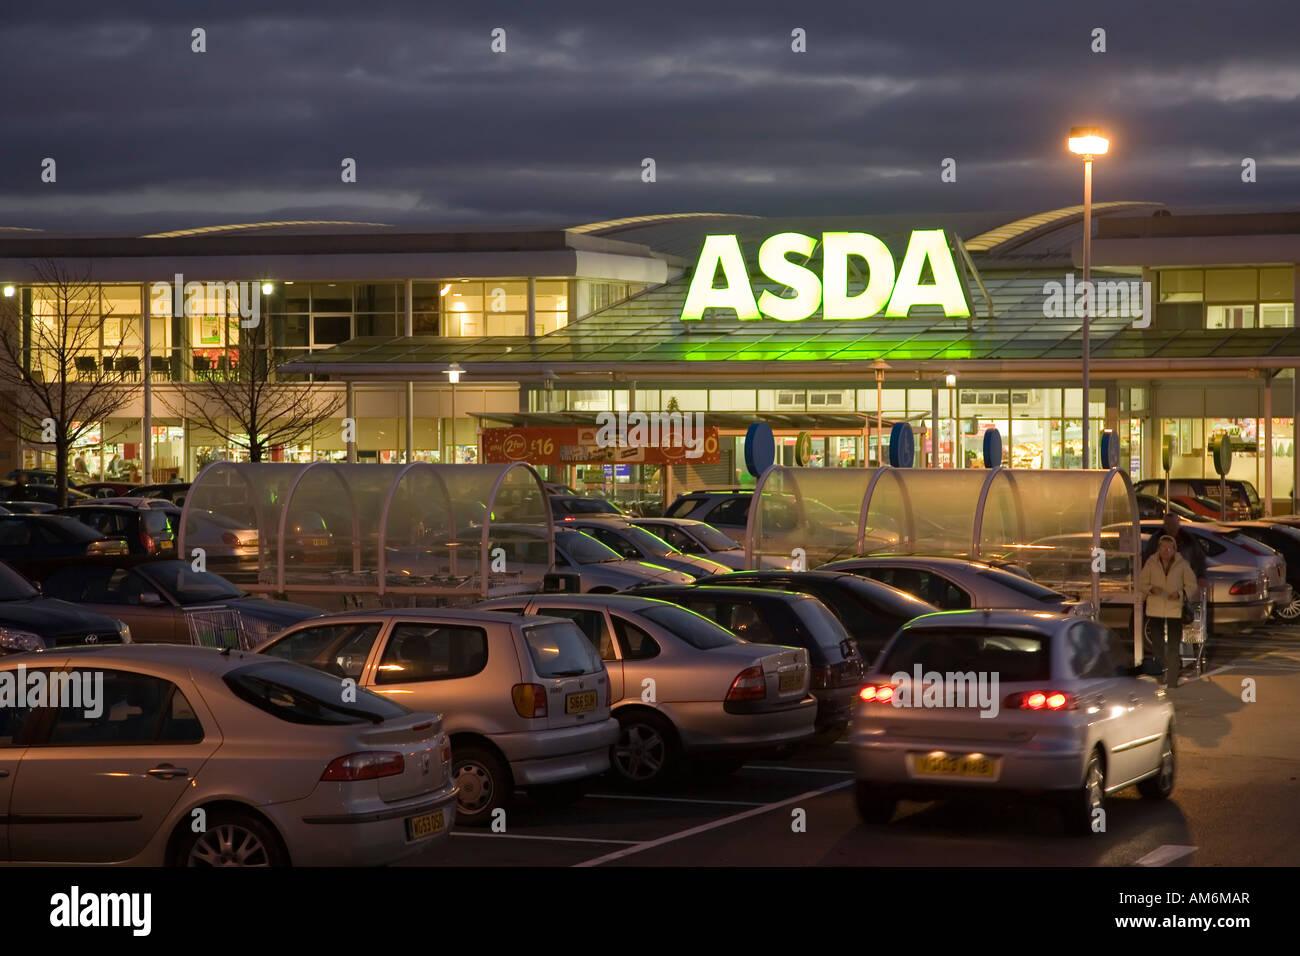 Car Parking Asda